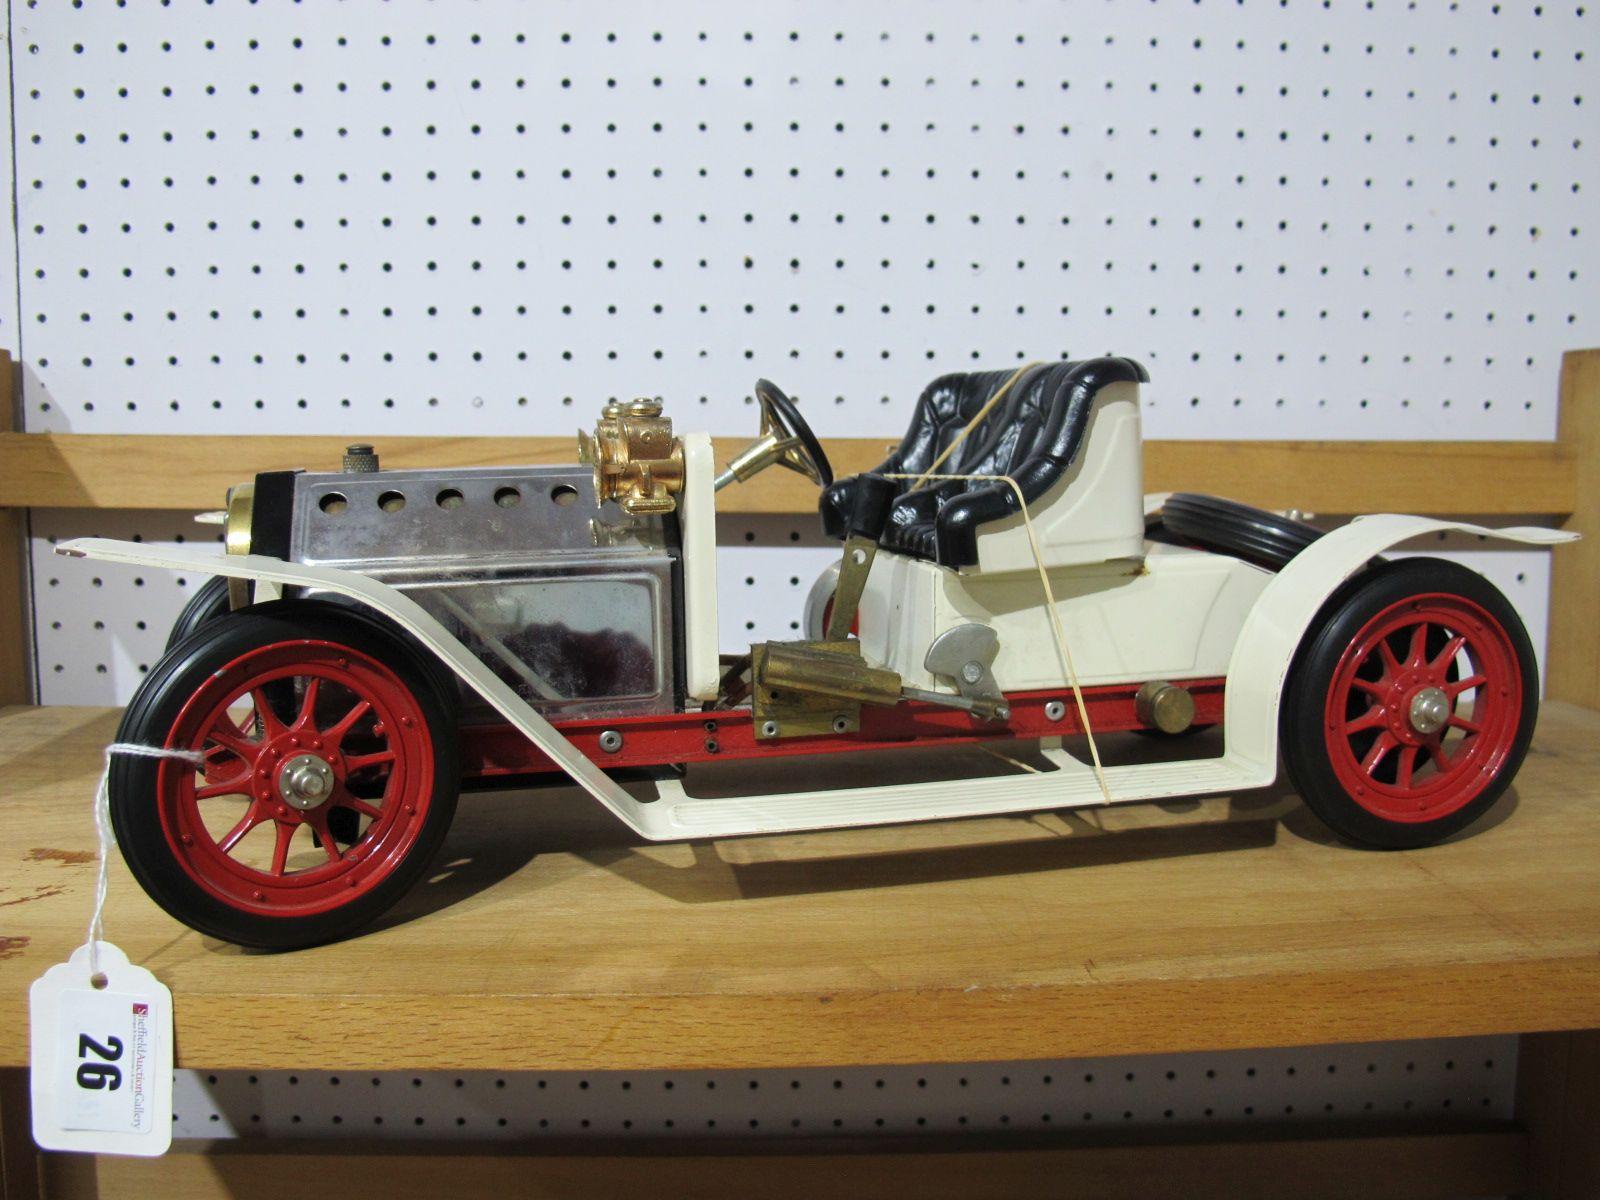 Lot 26 - A Mamod Live Steam SA1 Roadster, ten spoke wheel model with boiler sight glass. Model has been